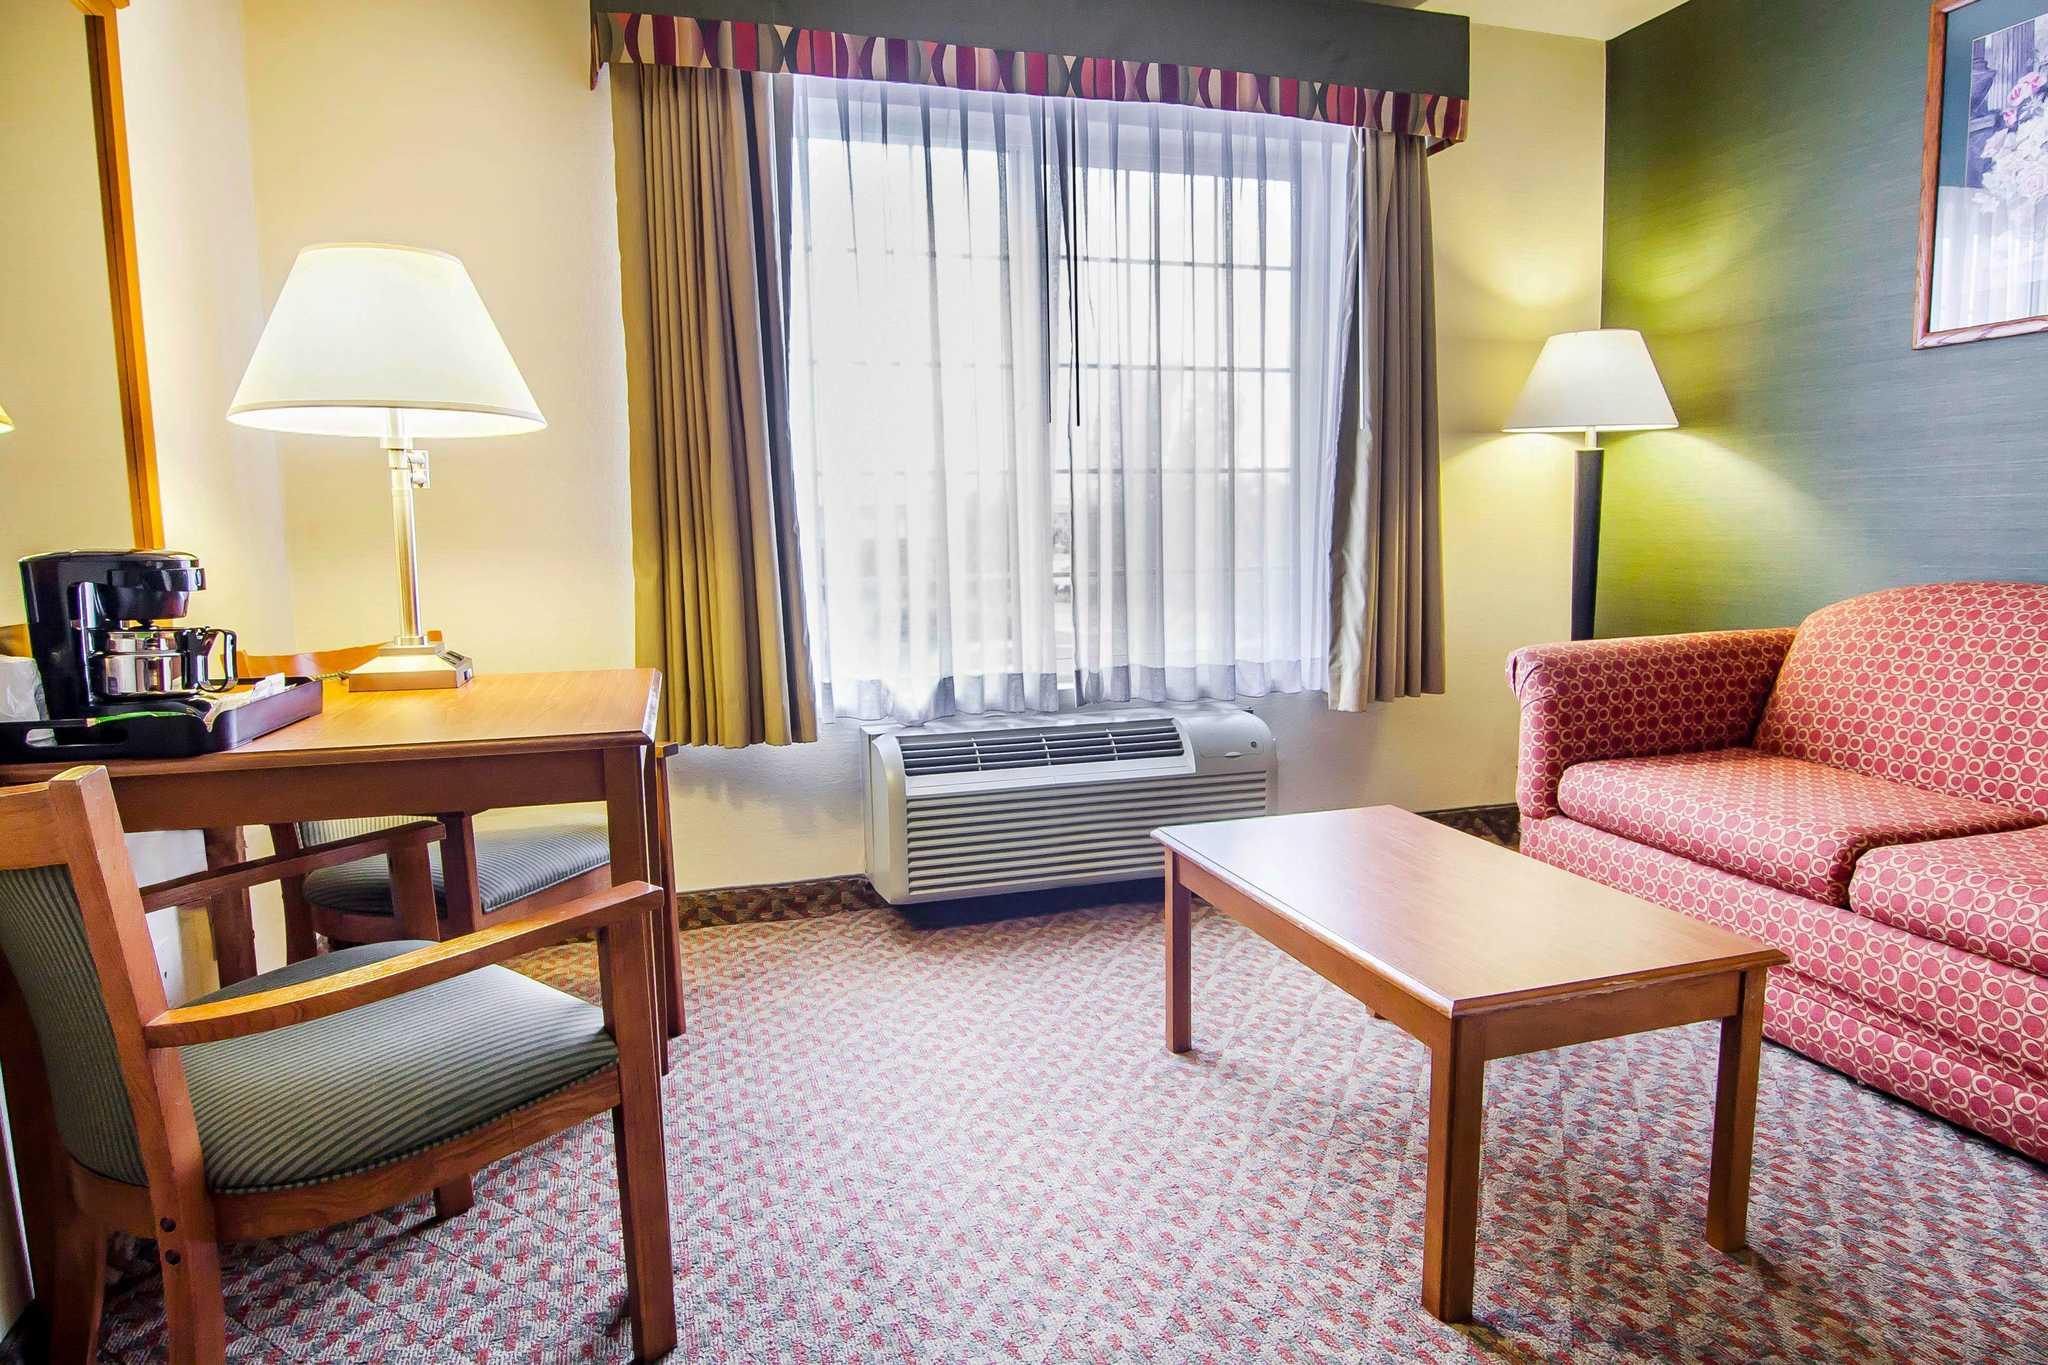 Comfort Inn & Suites image 44